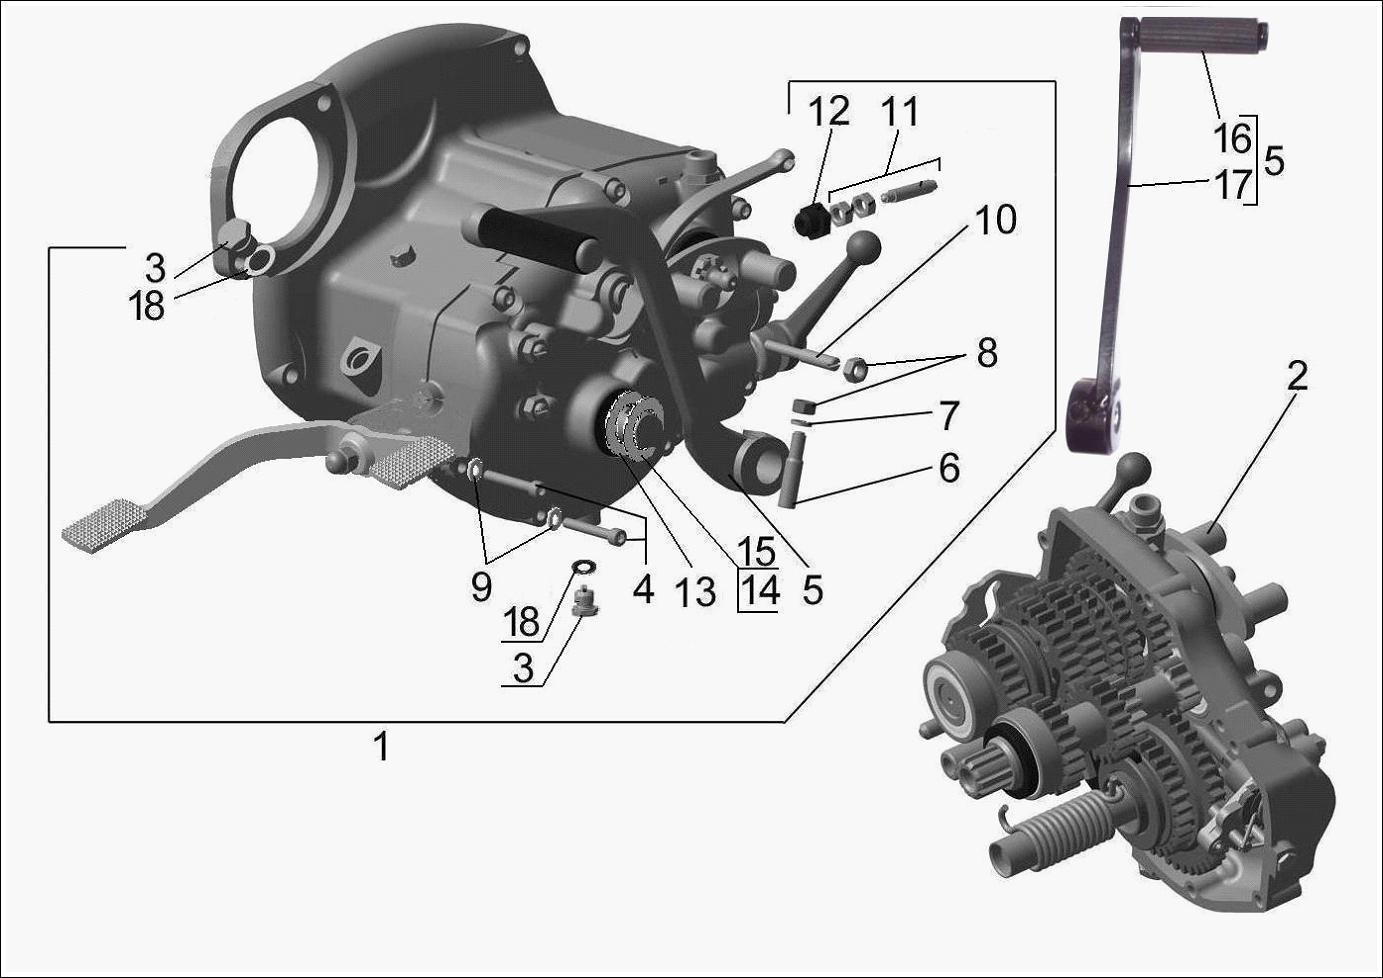 Ural Engine Diagram - Everything About Wiring Diagram • on ural parts, ural engine diagram, ural ignition diagram,